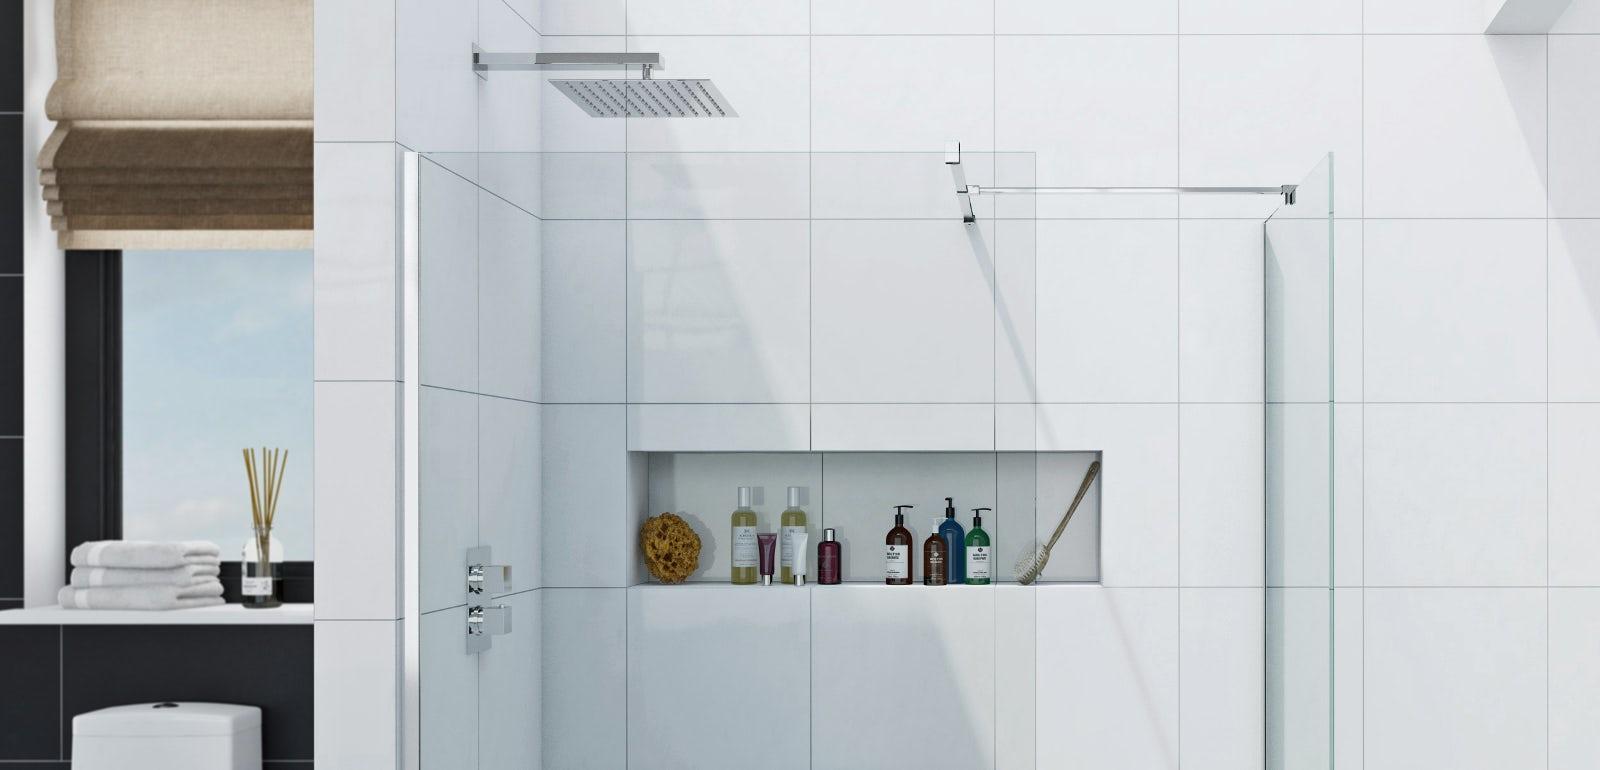 3d bathroom design software 3d design software planning for Bathroom design software